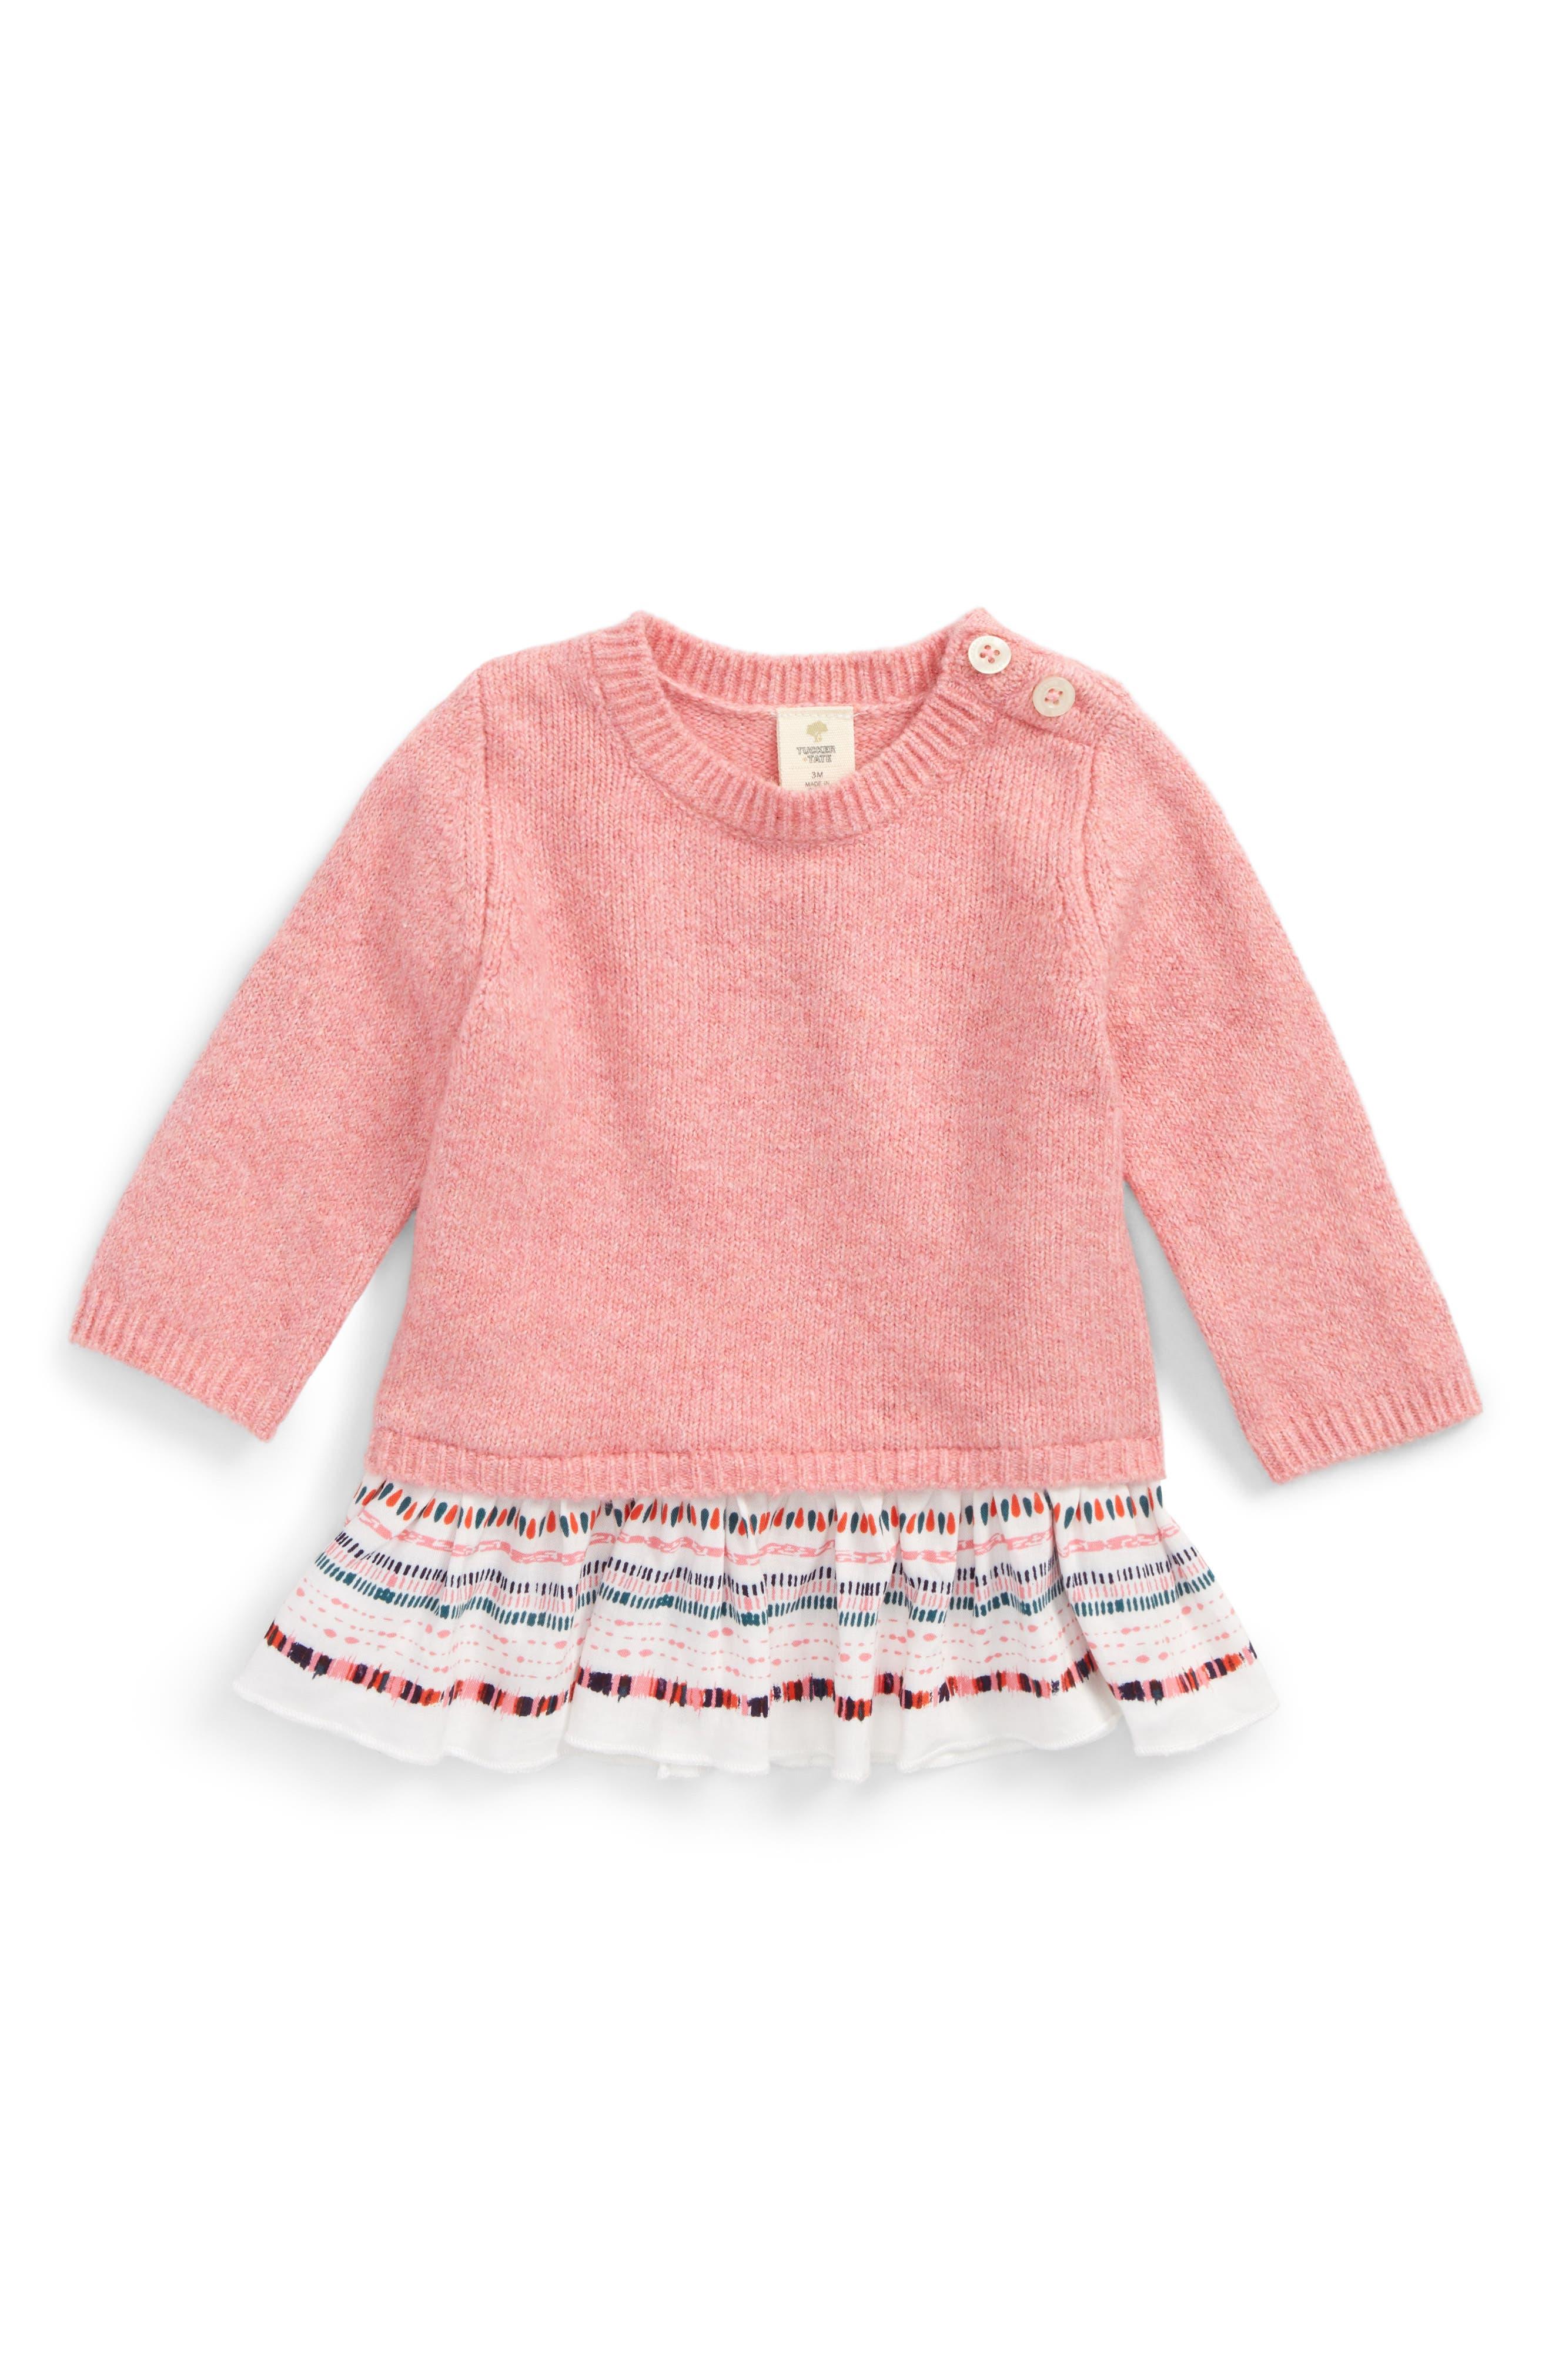 Ruffle Sweater,                             Main thumbnail 1, color,                             Pink Lemonade Heather Geo